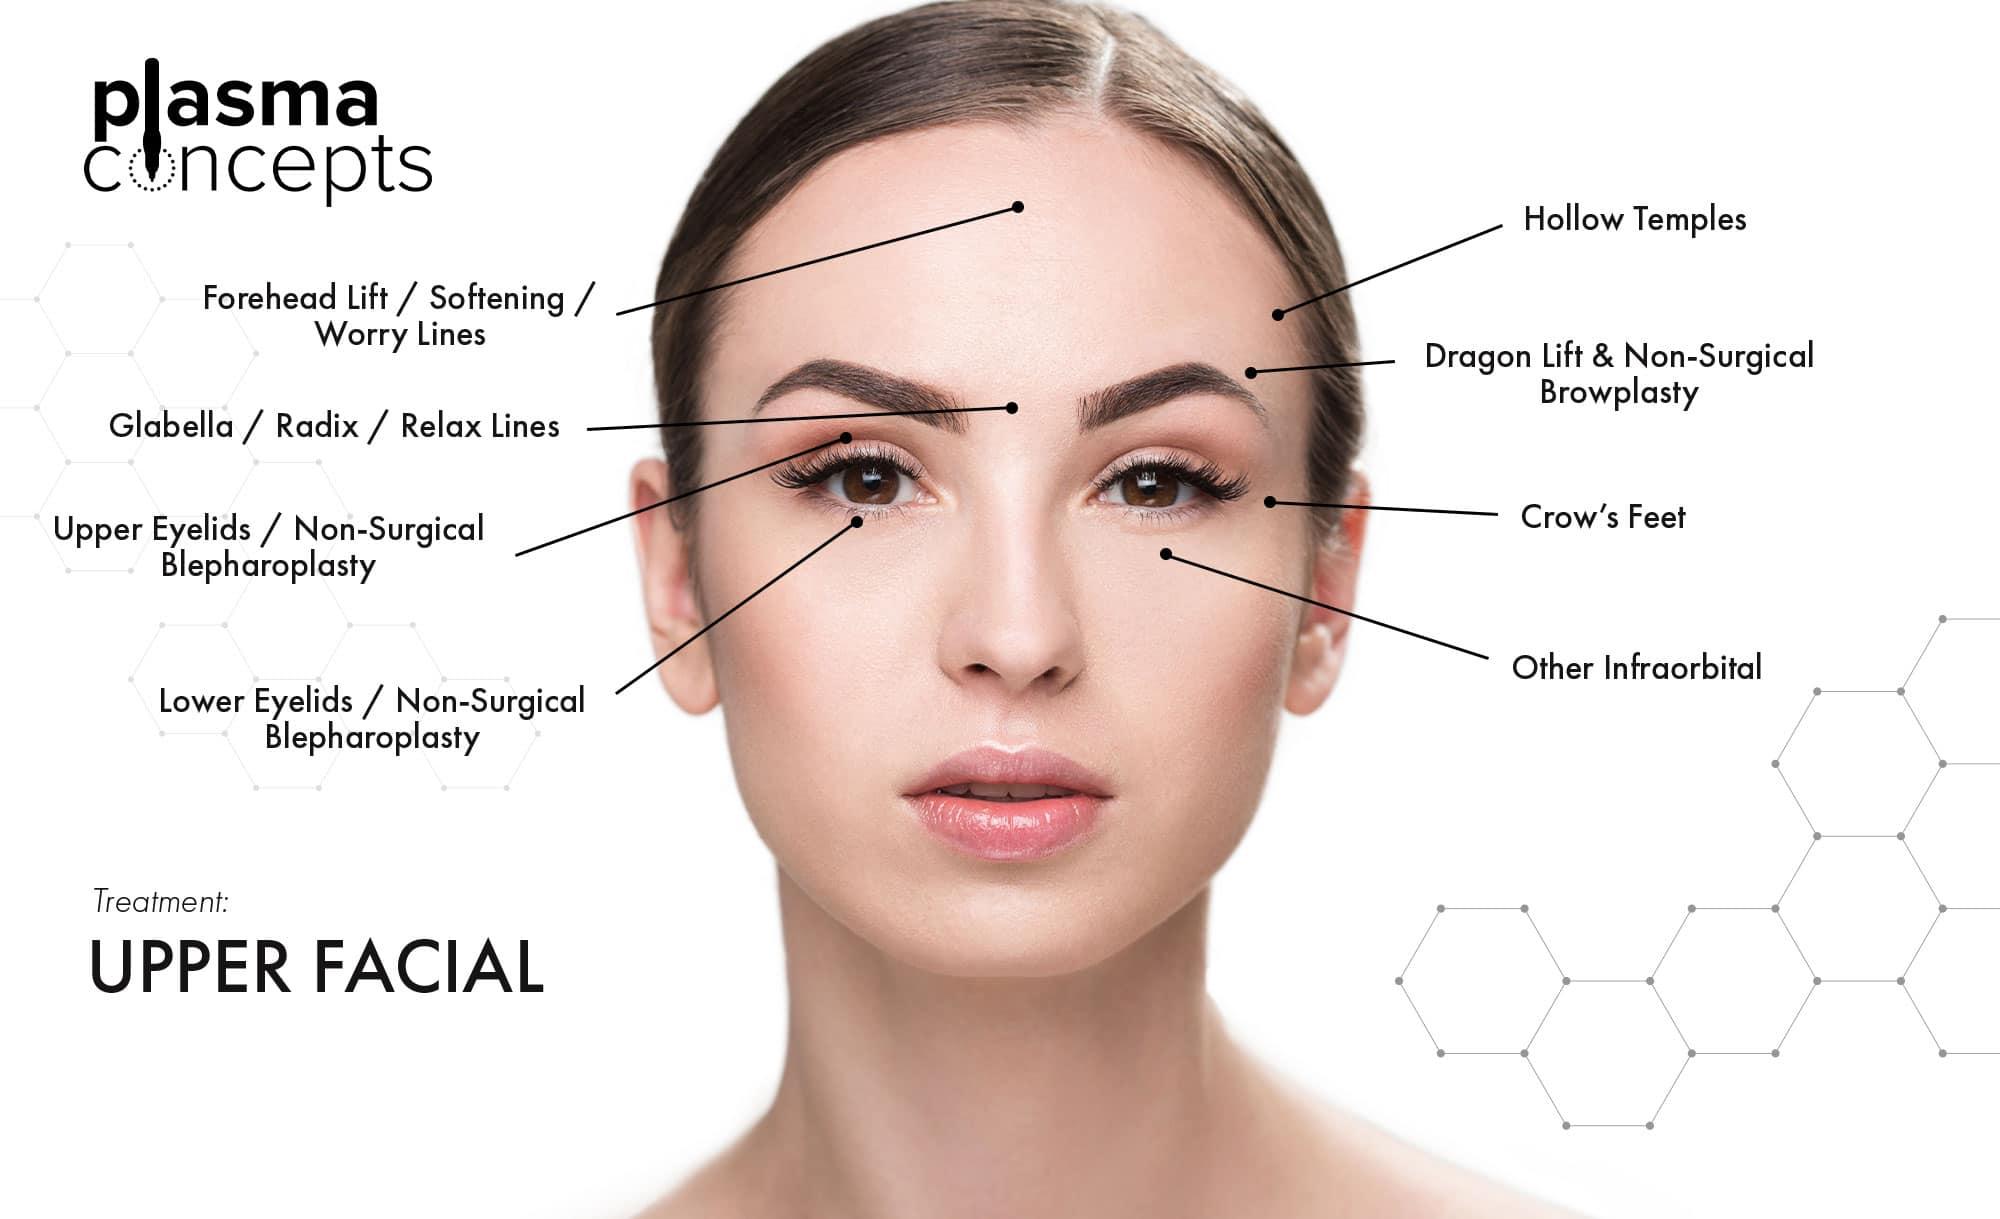 Gainesville Upper Facial Treatment Guide The Plasma Concepts Pen